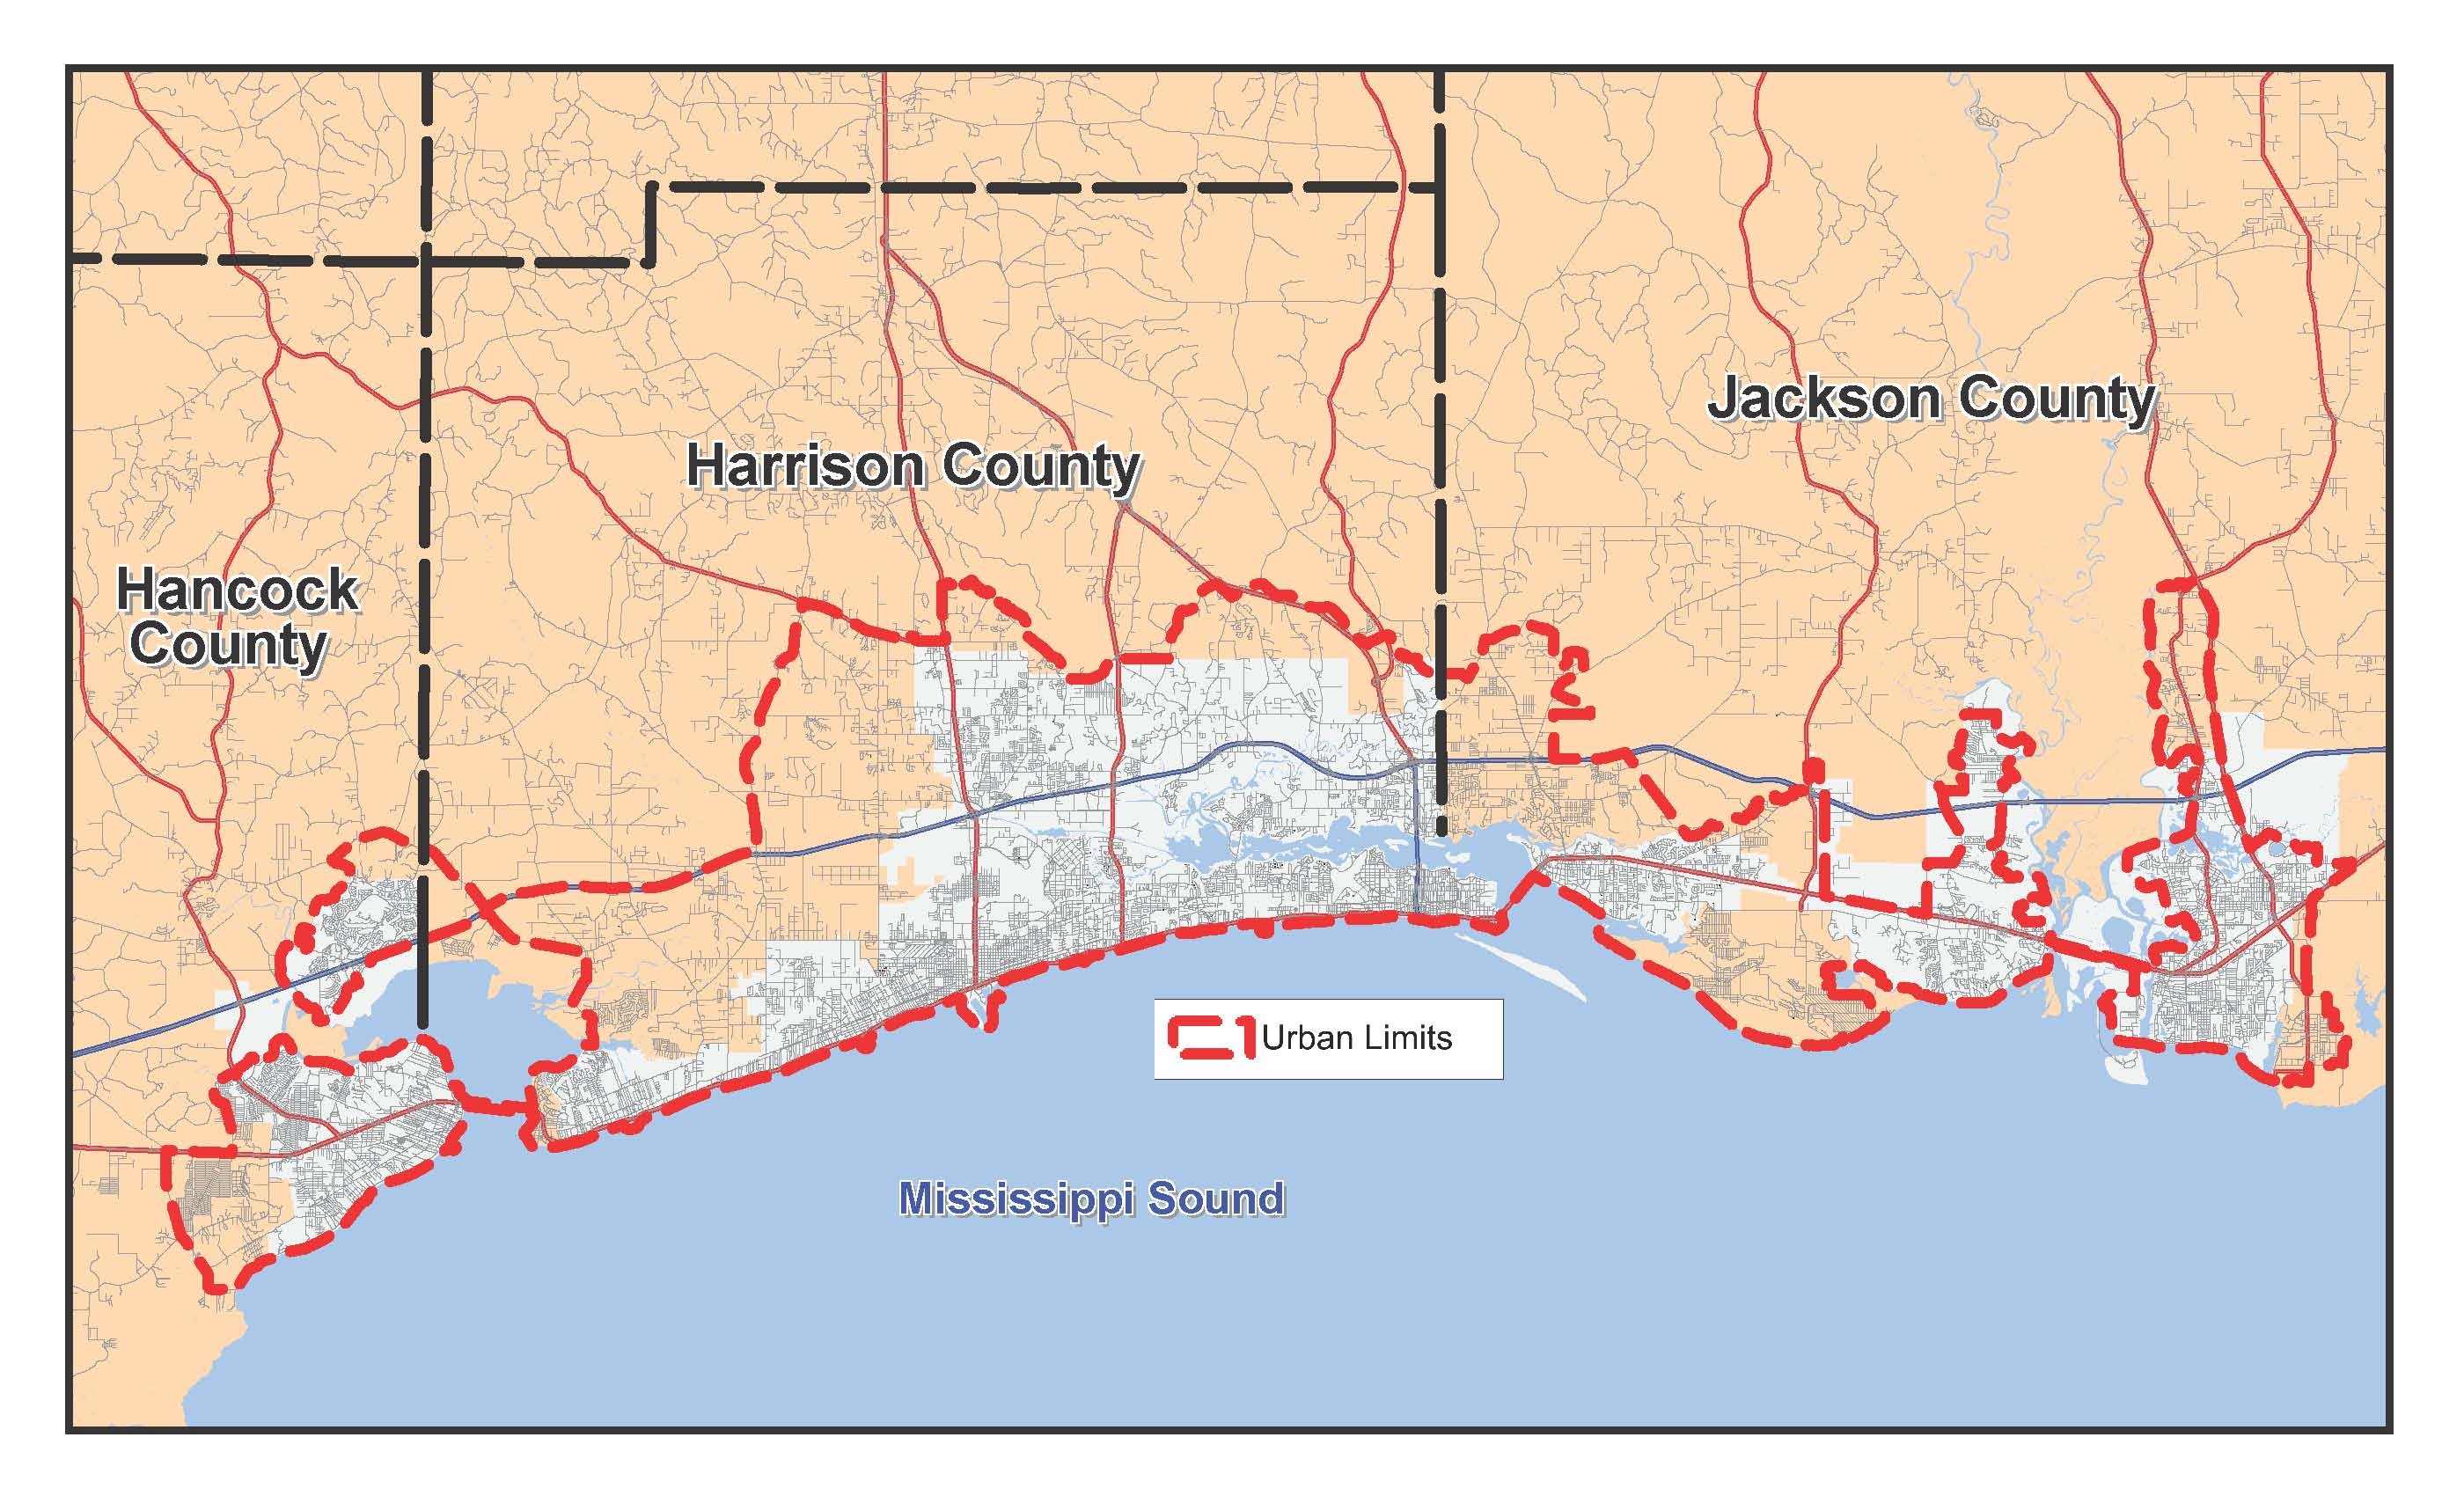 2015 Urbanized Area Map